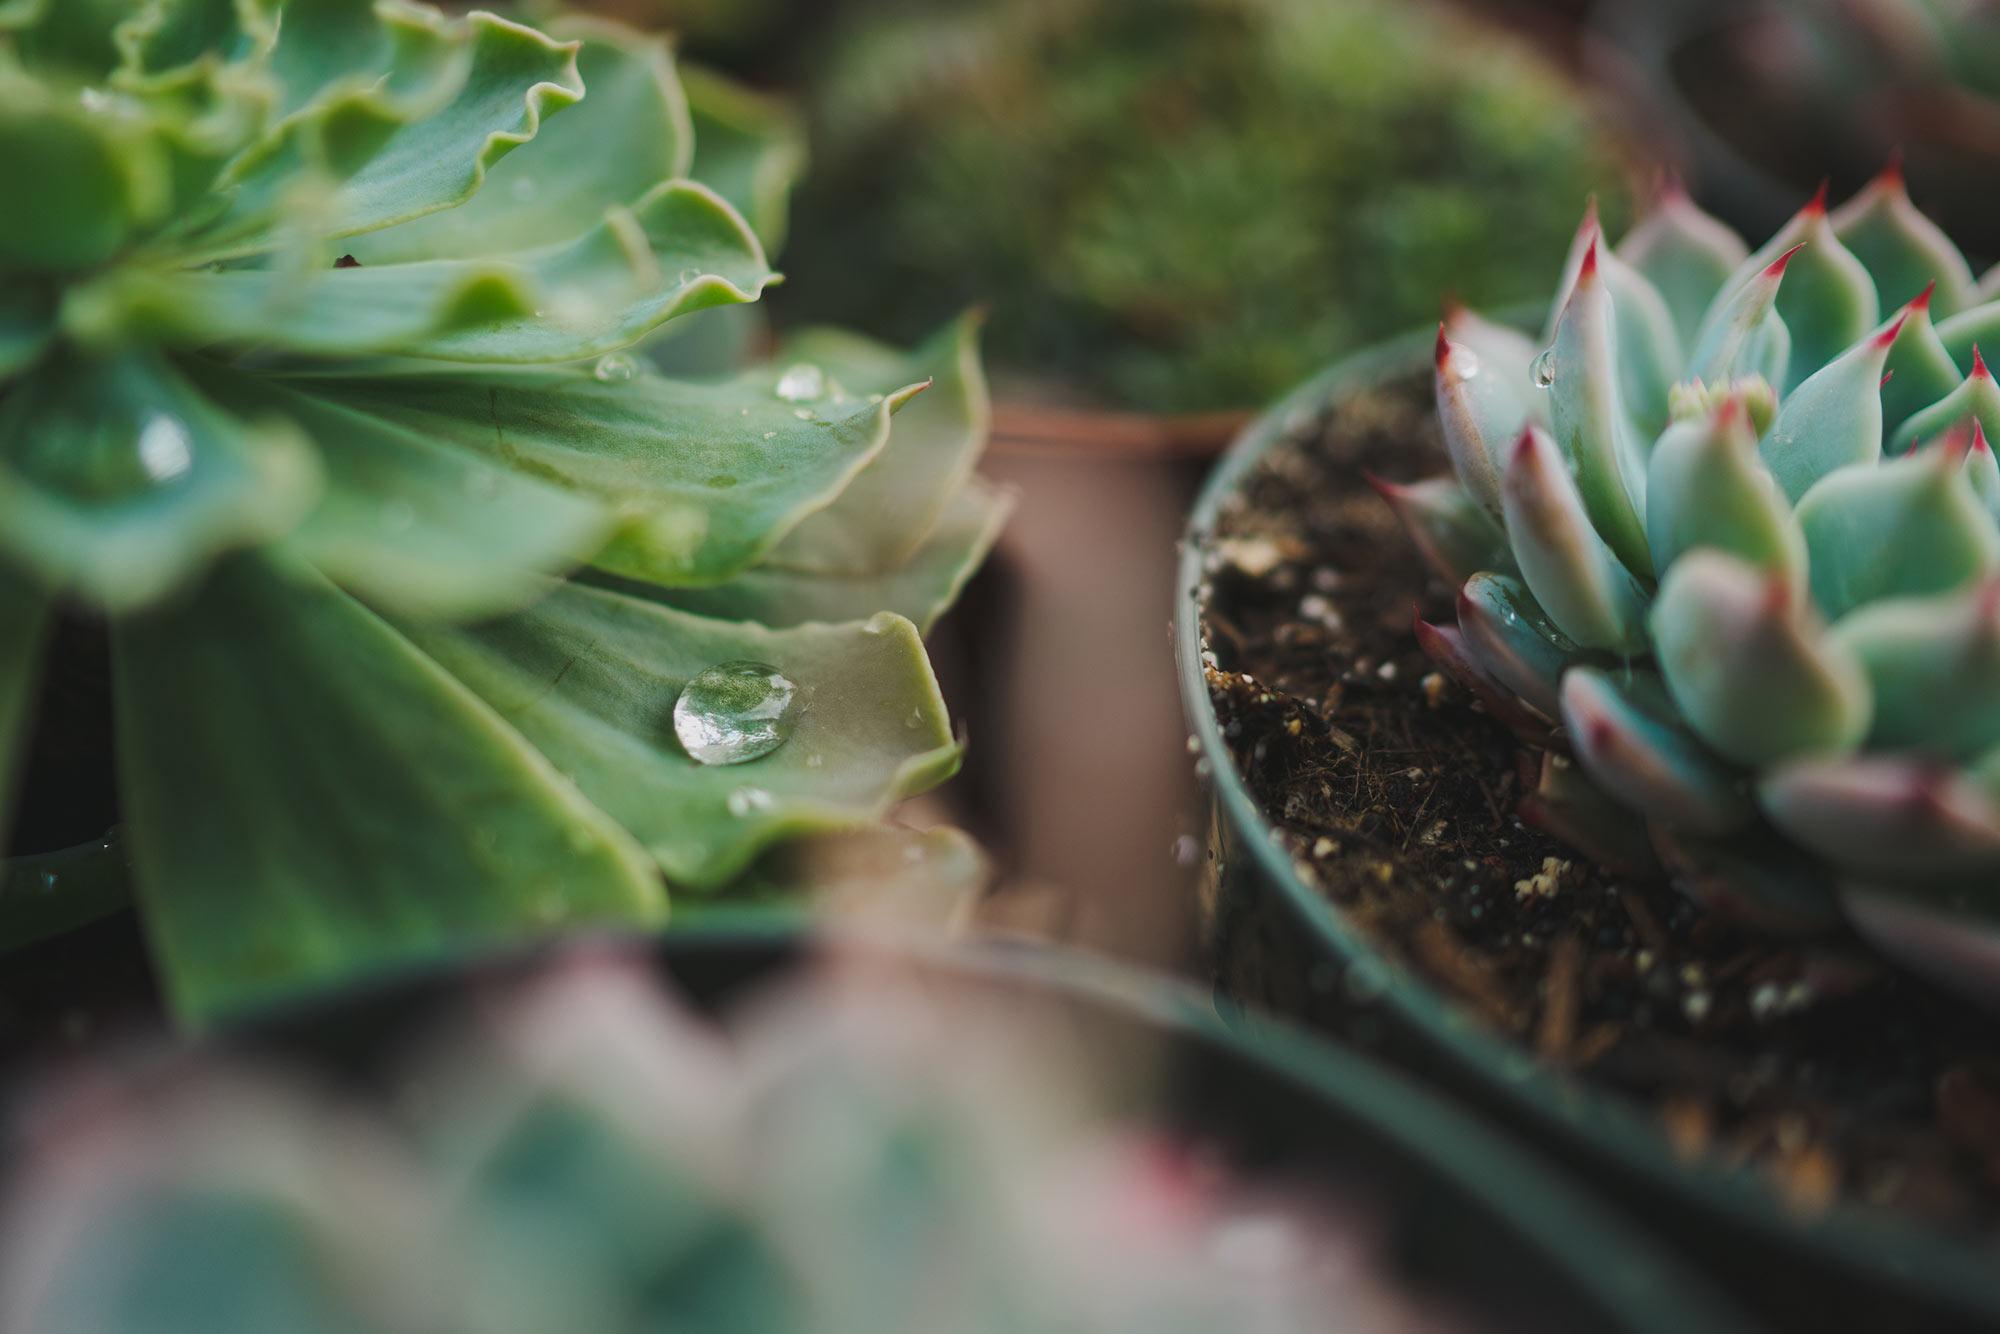 flora-grubb-2-web.jpg